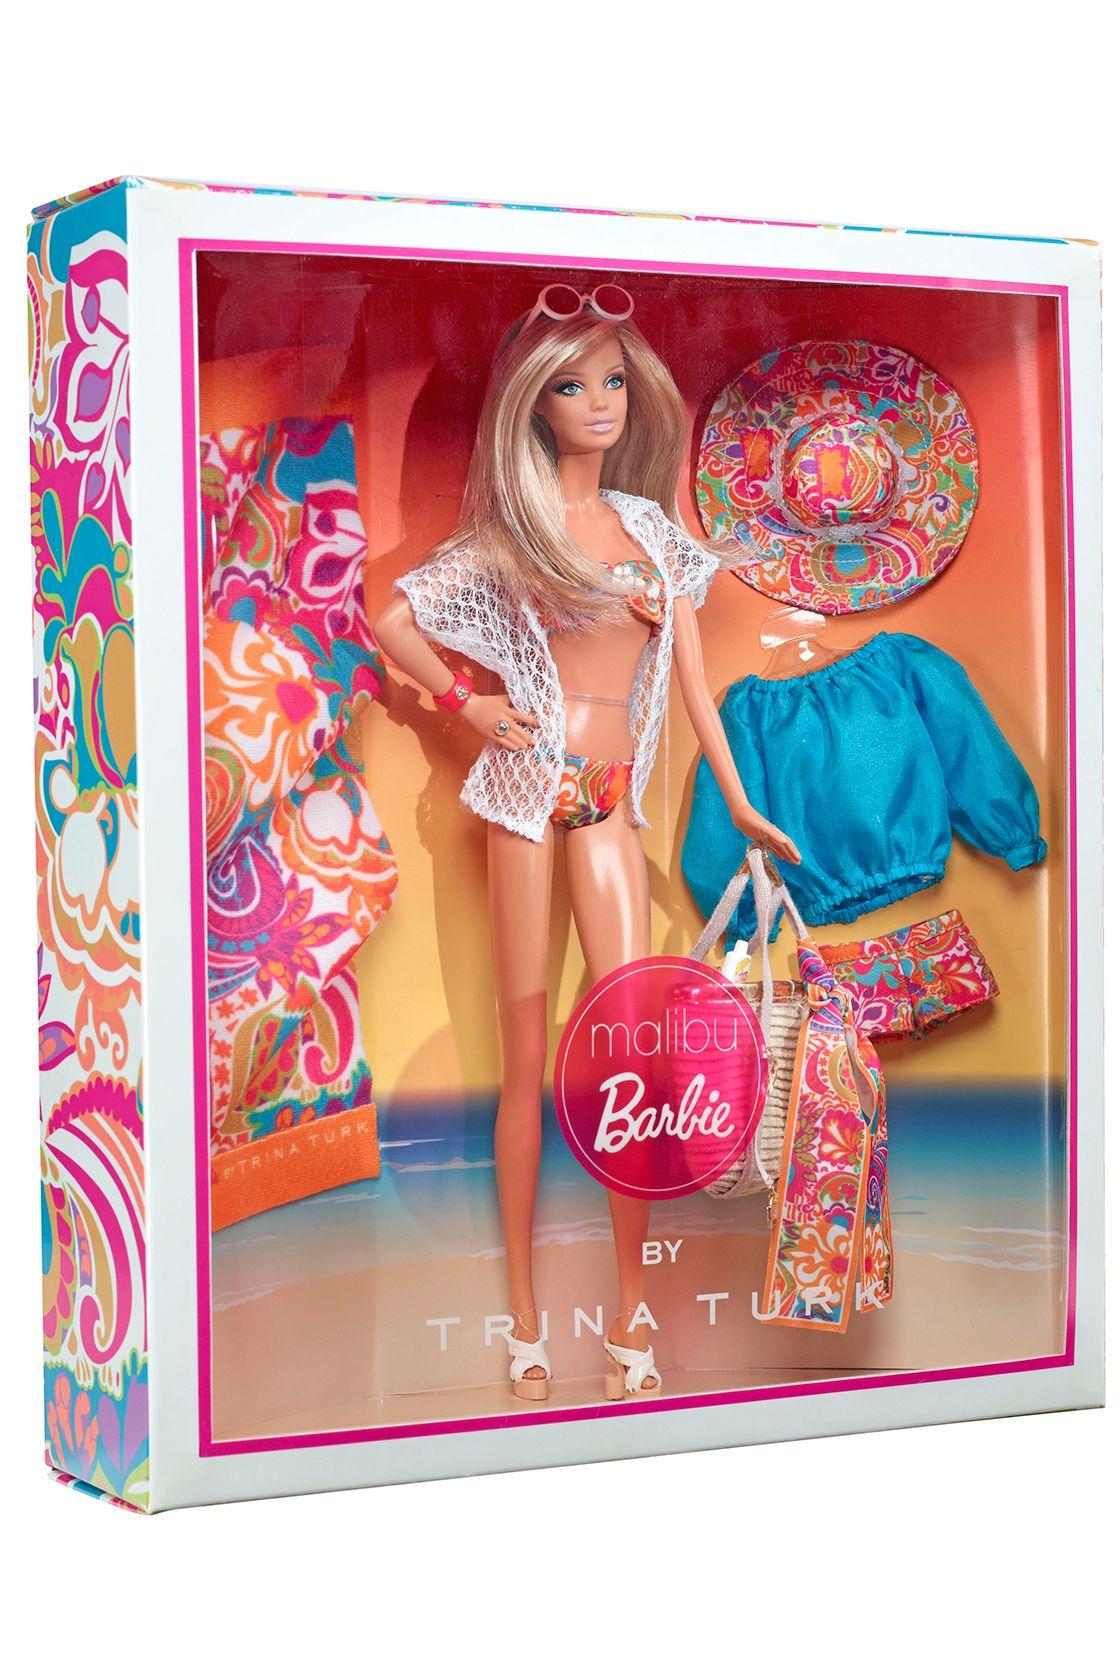 4fbf3899ee5c Introducing Malibu Barbie by Trina Turk!